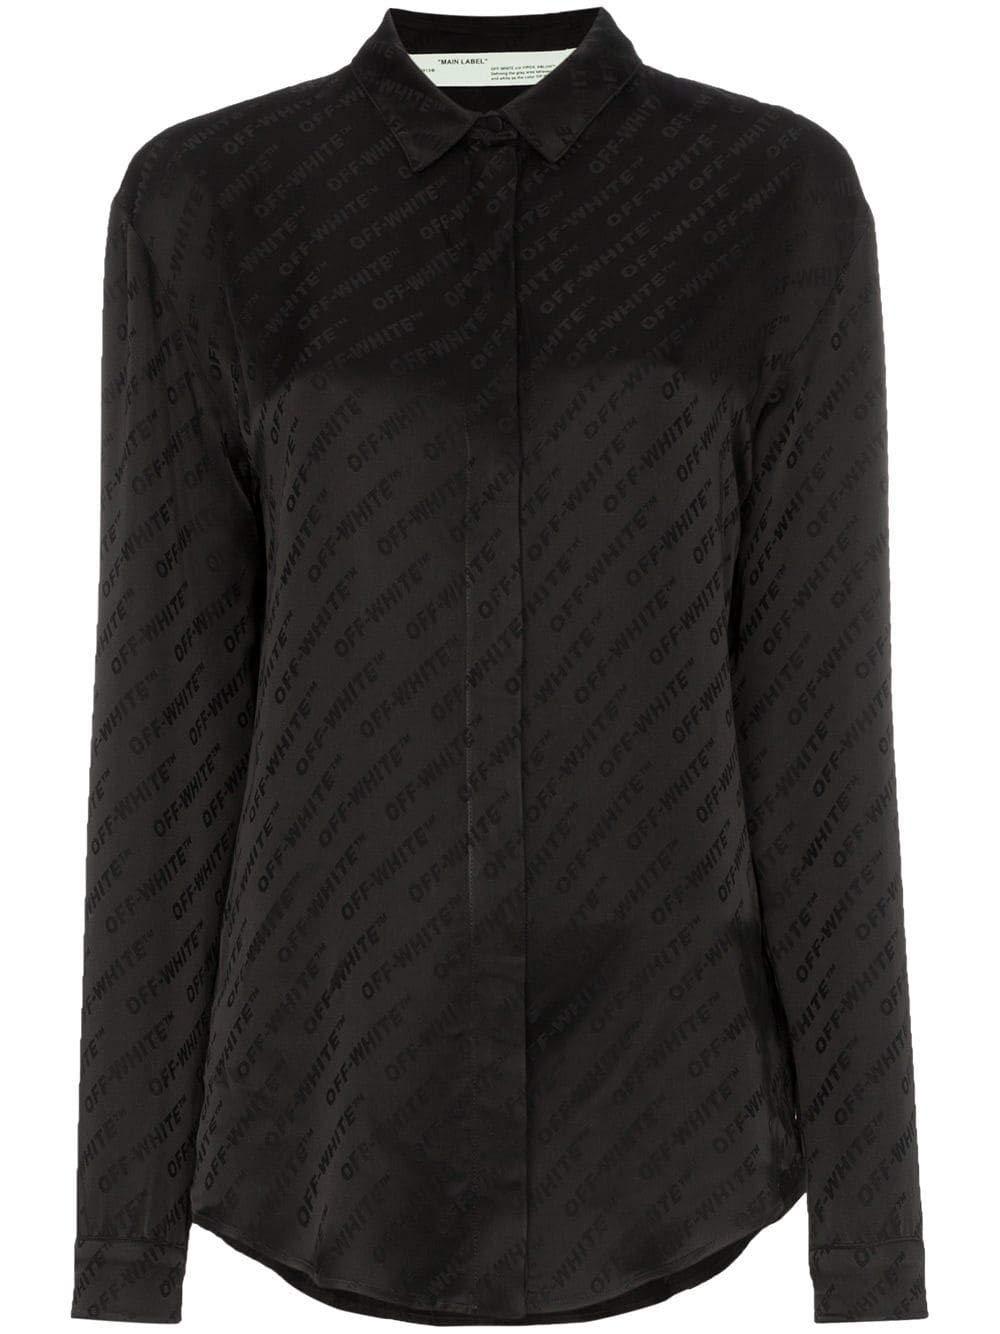 Brand Size 42 OFFWHITE Women's OWGA031R19C860571000 Black Acetate Shirt